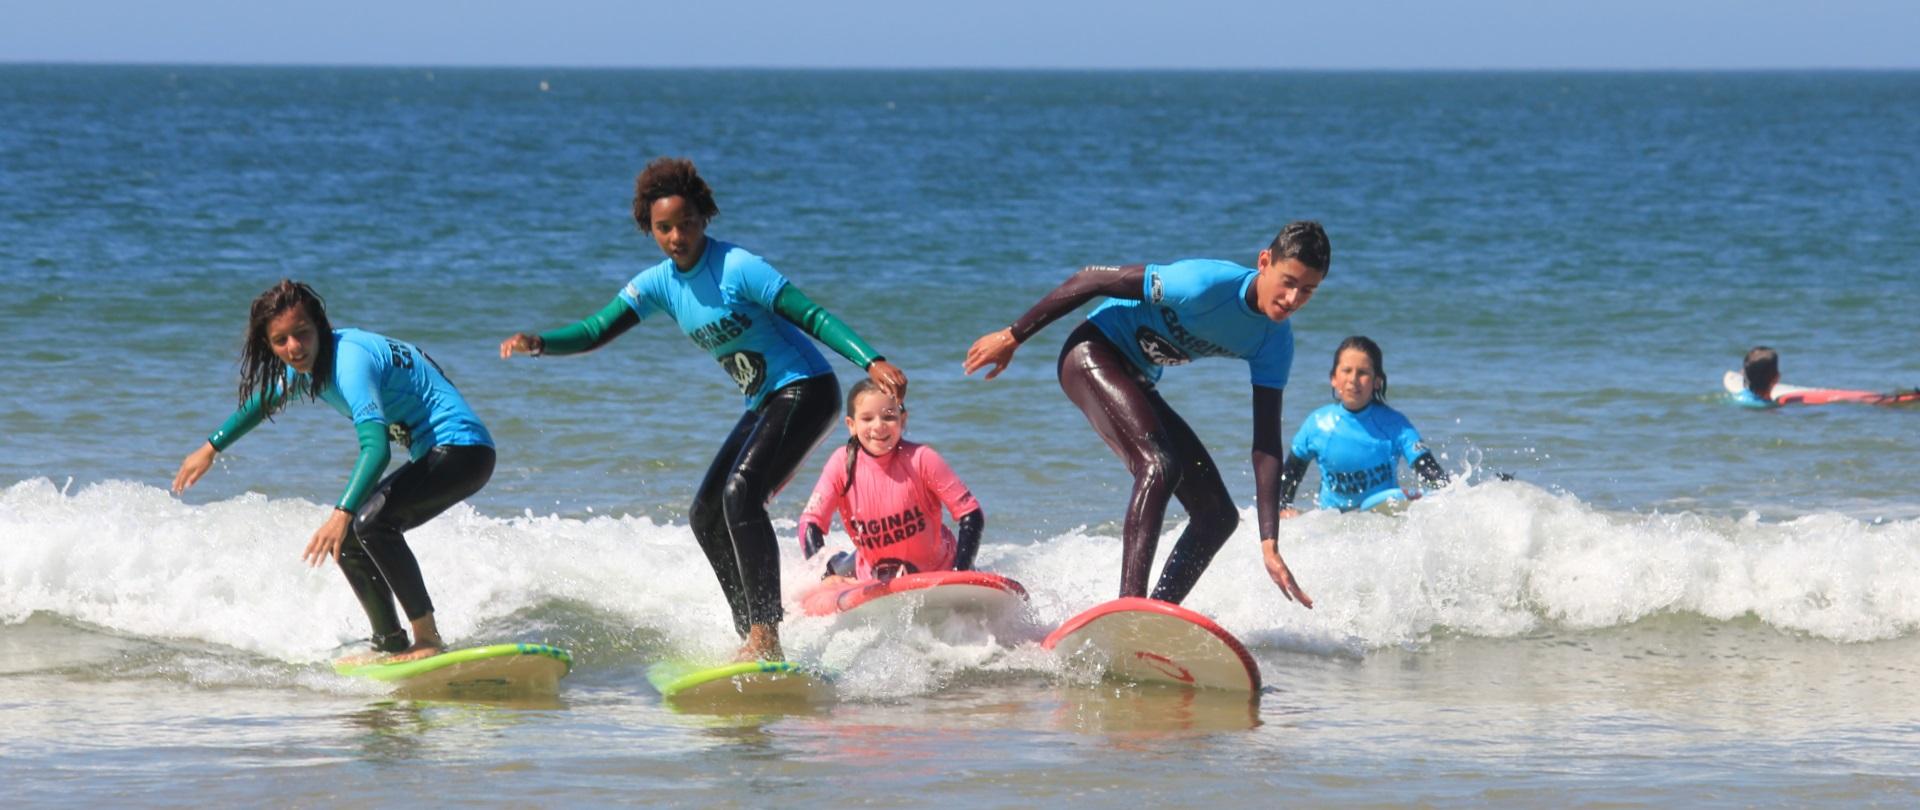 SAL SURFING SCHOOL